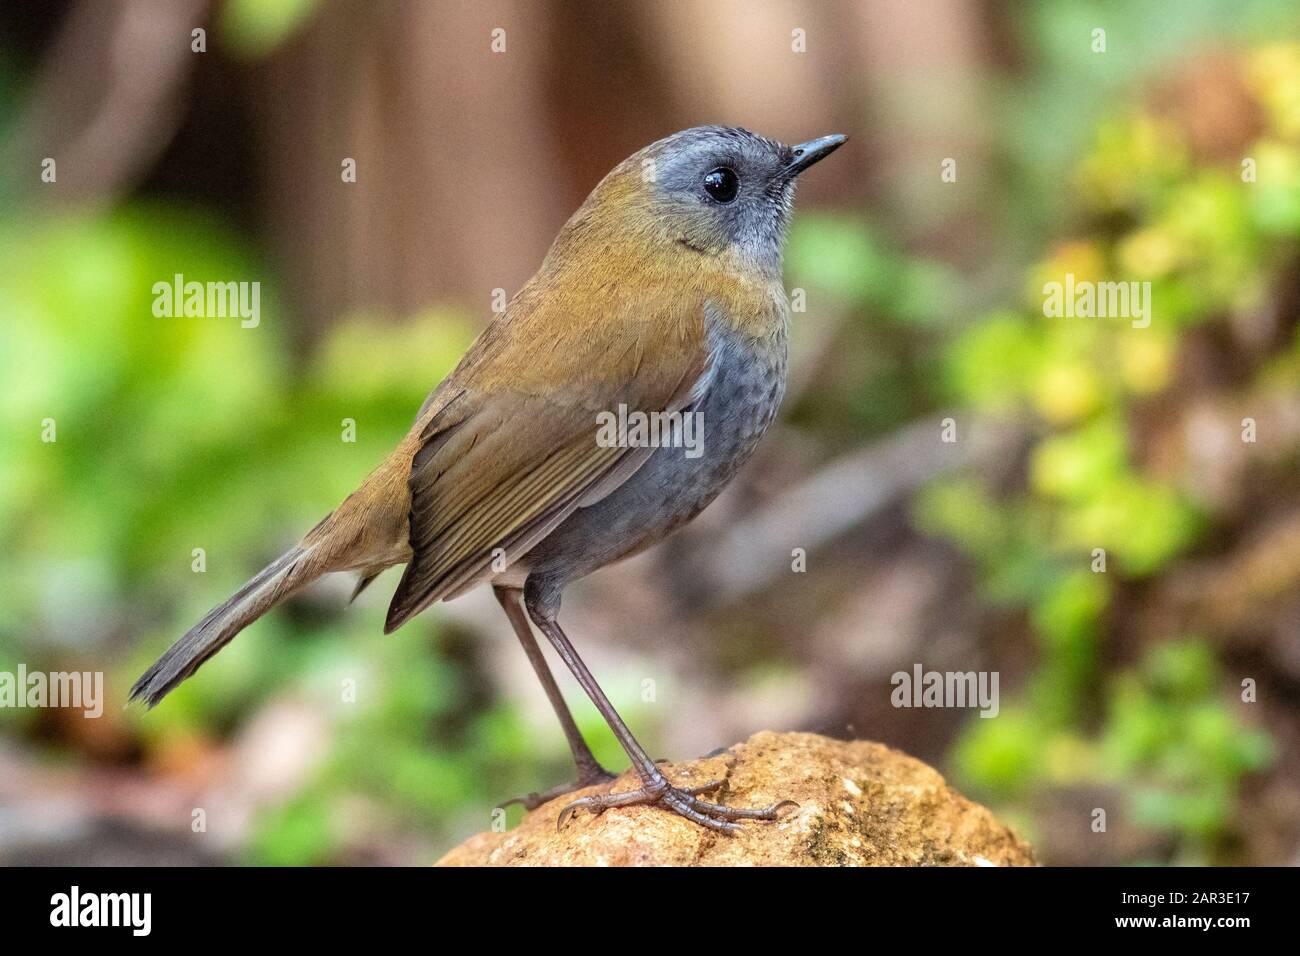 Black-billed nightingale-thrush (Catharus gracilirostris) - Paraiso Quetzal Lodge, San Gerardo de Dota, San Jose Province, Costa Rica Stock Photo